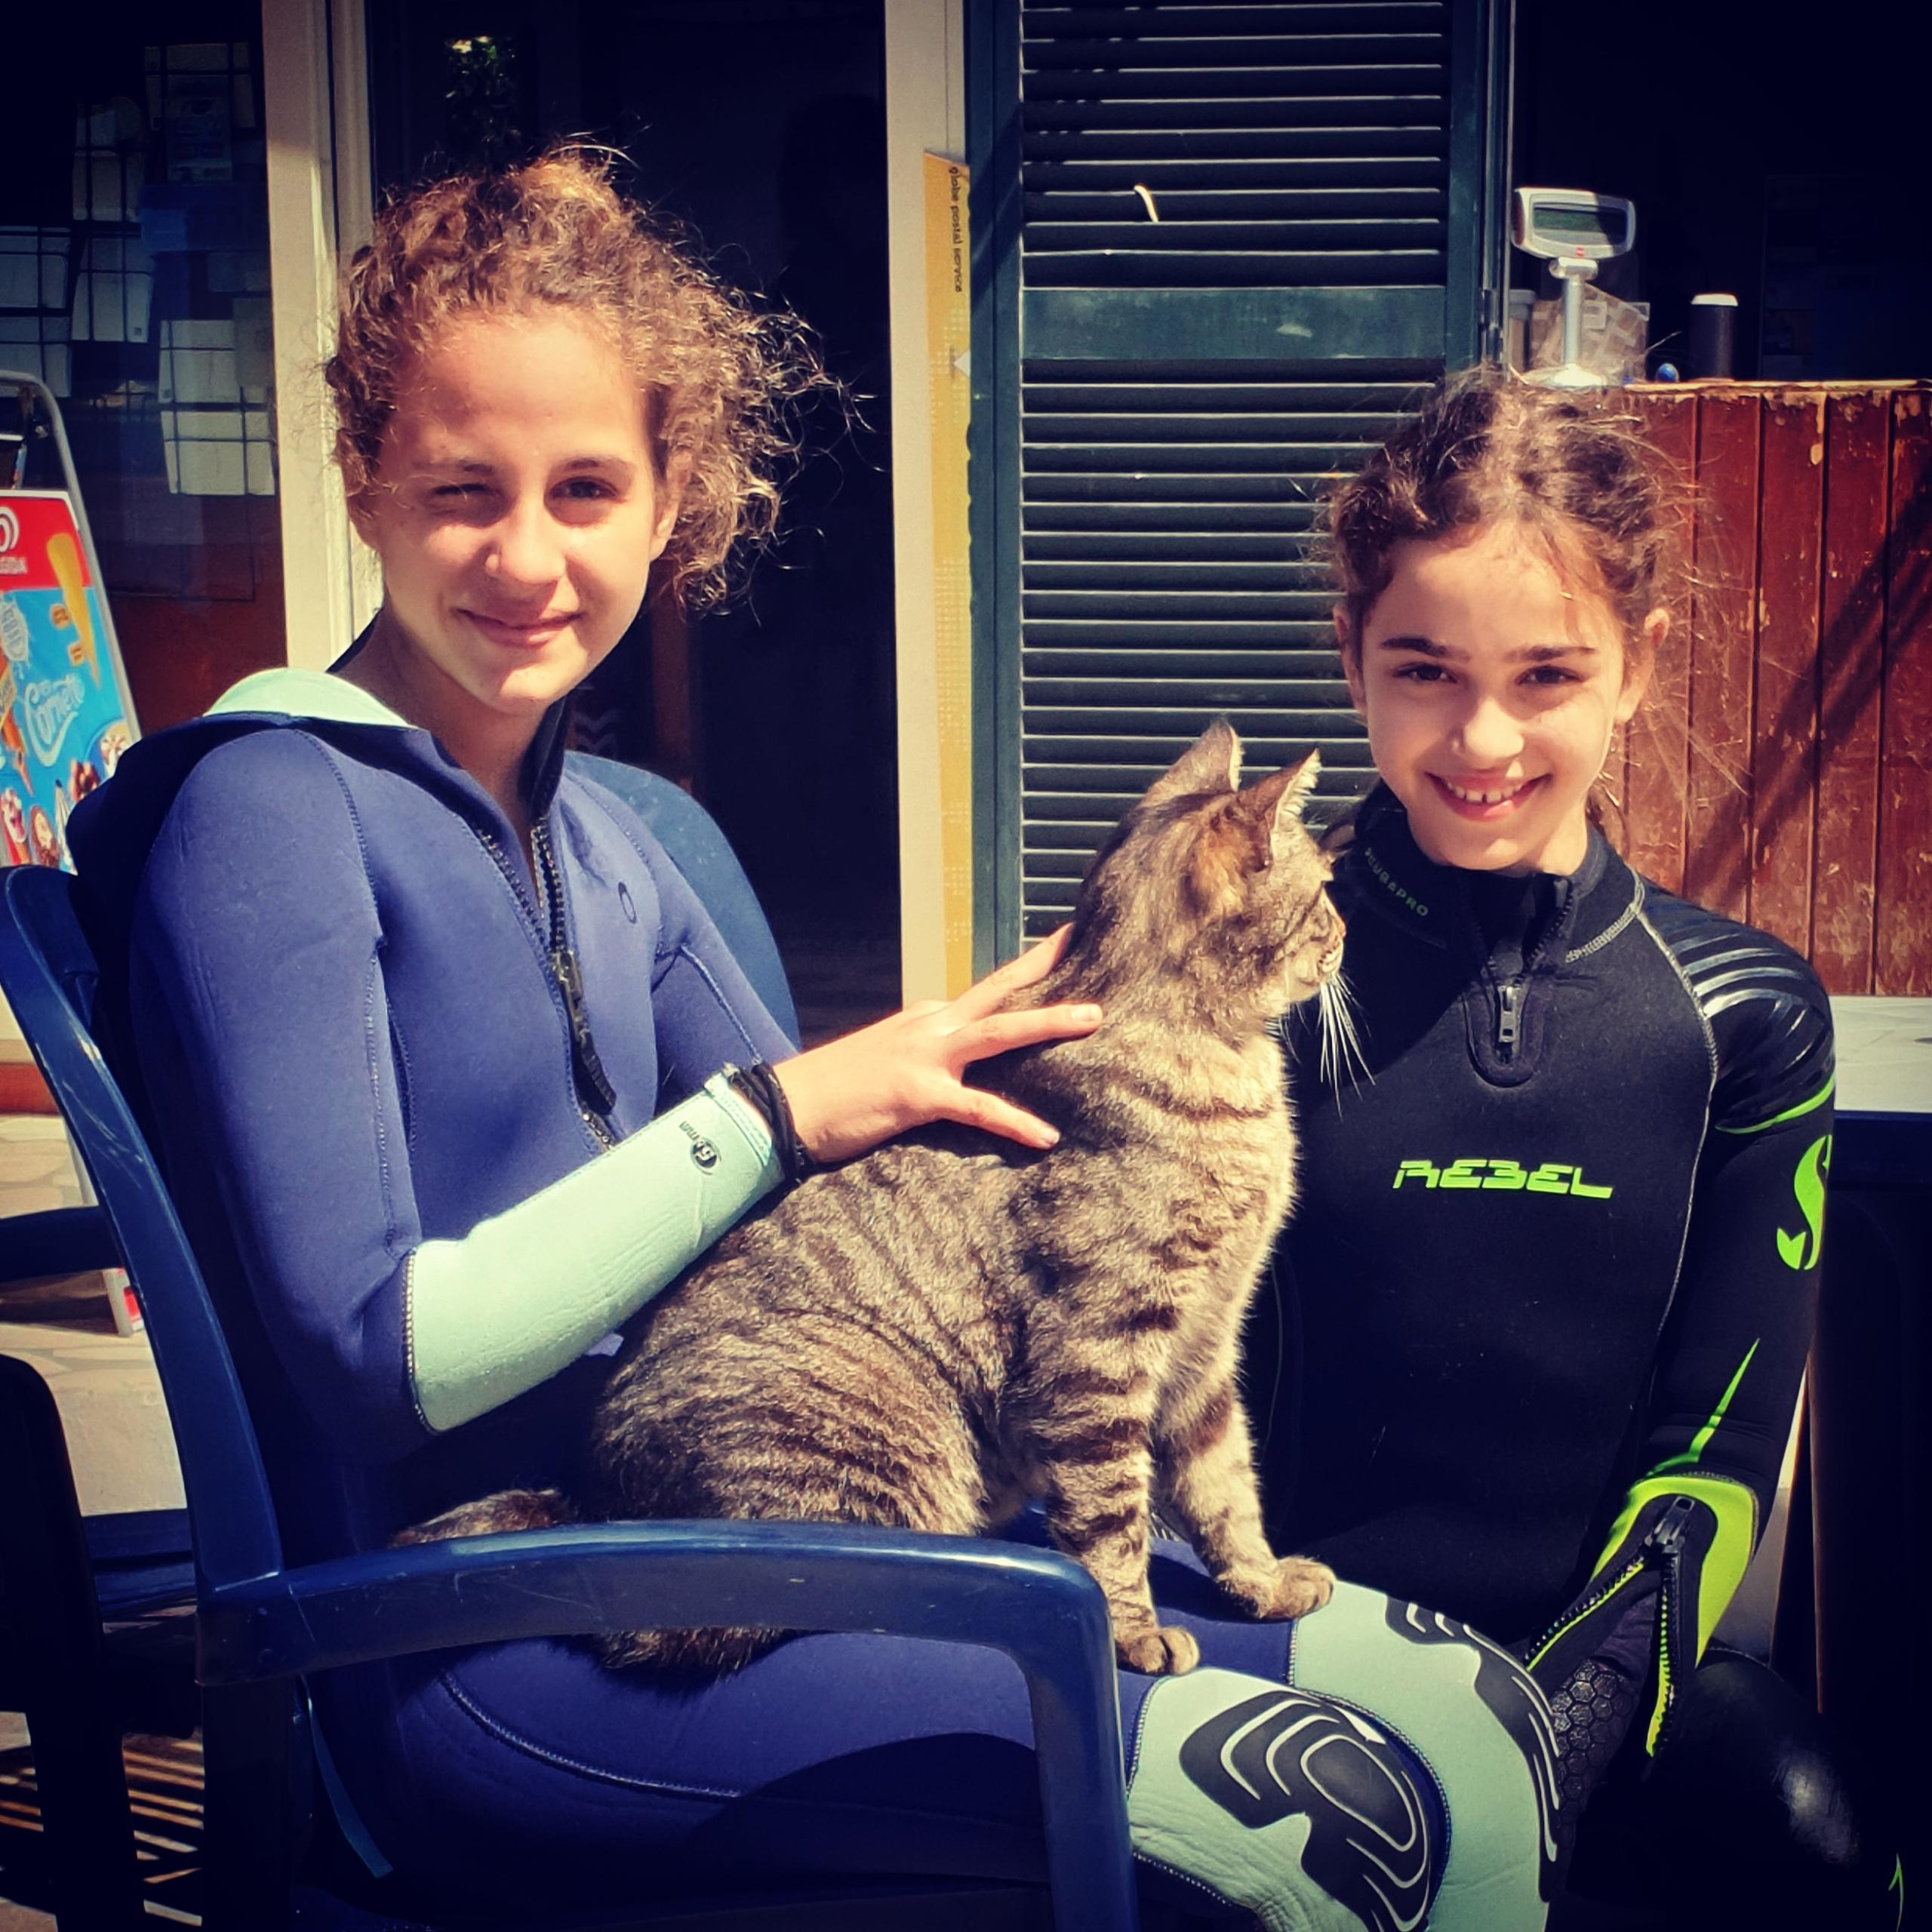 Alexander Snavy the cat e le piccole sub